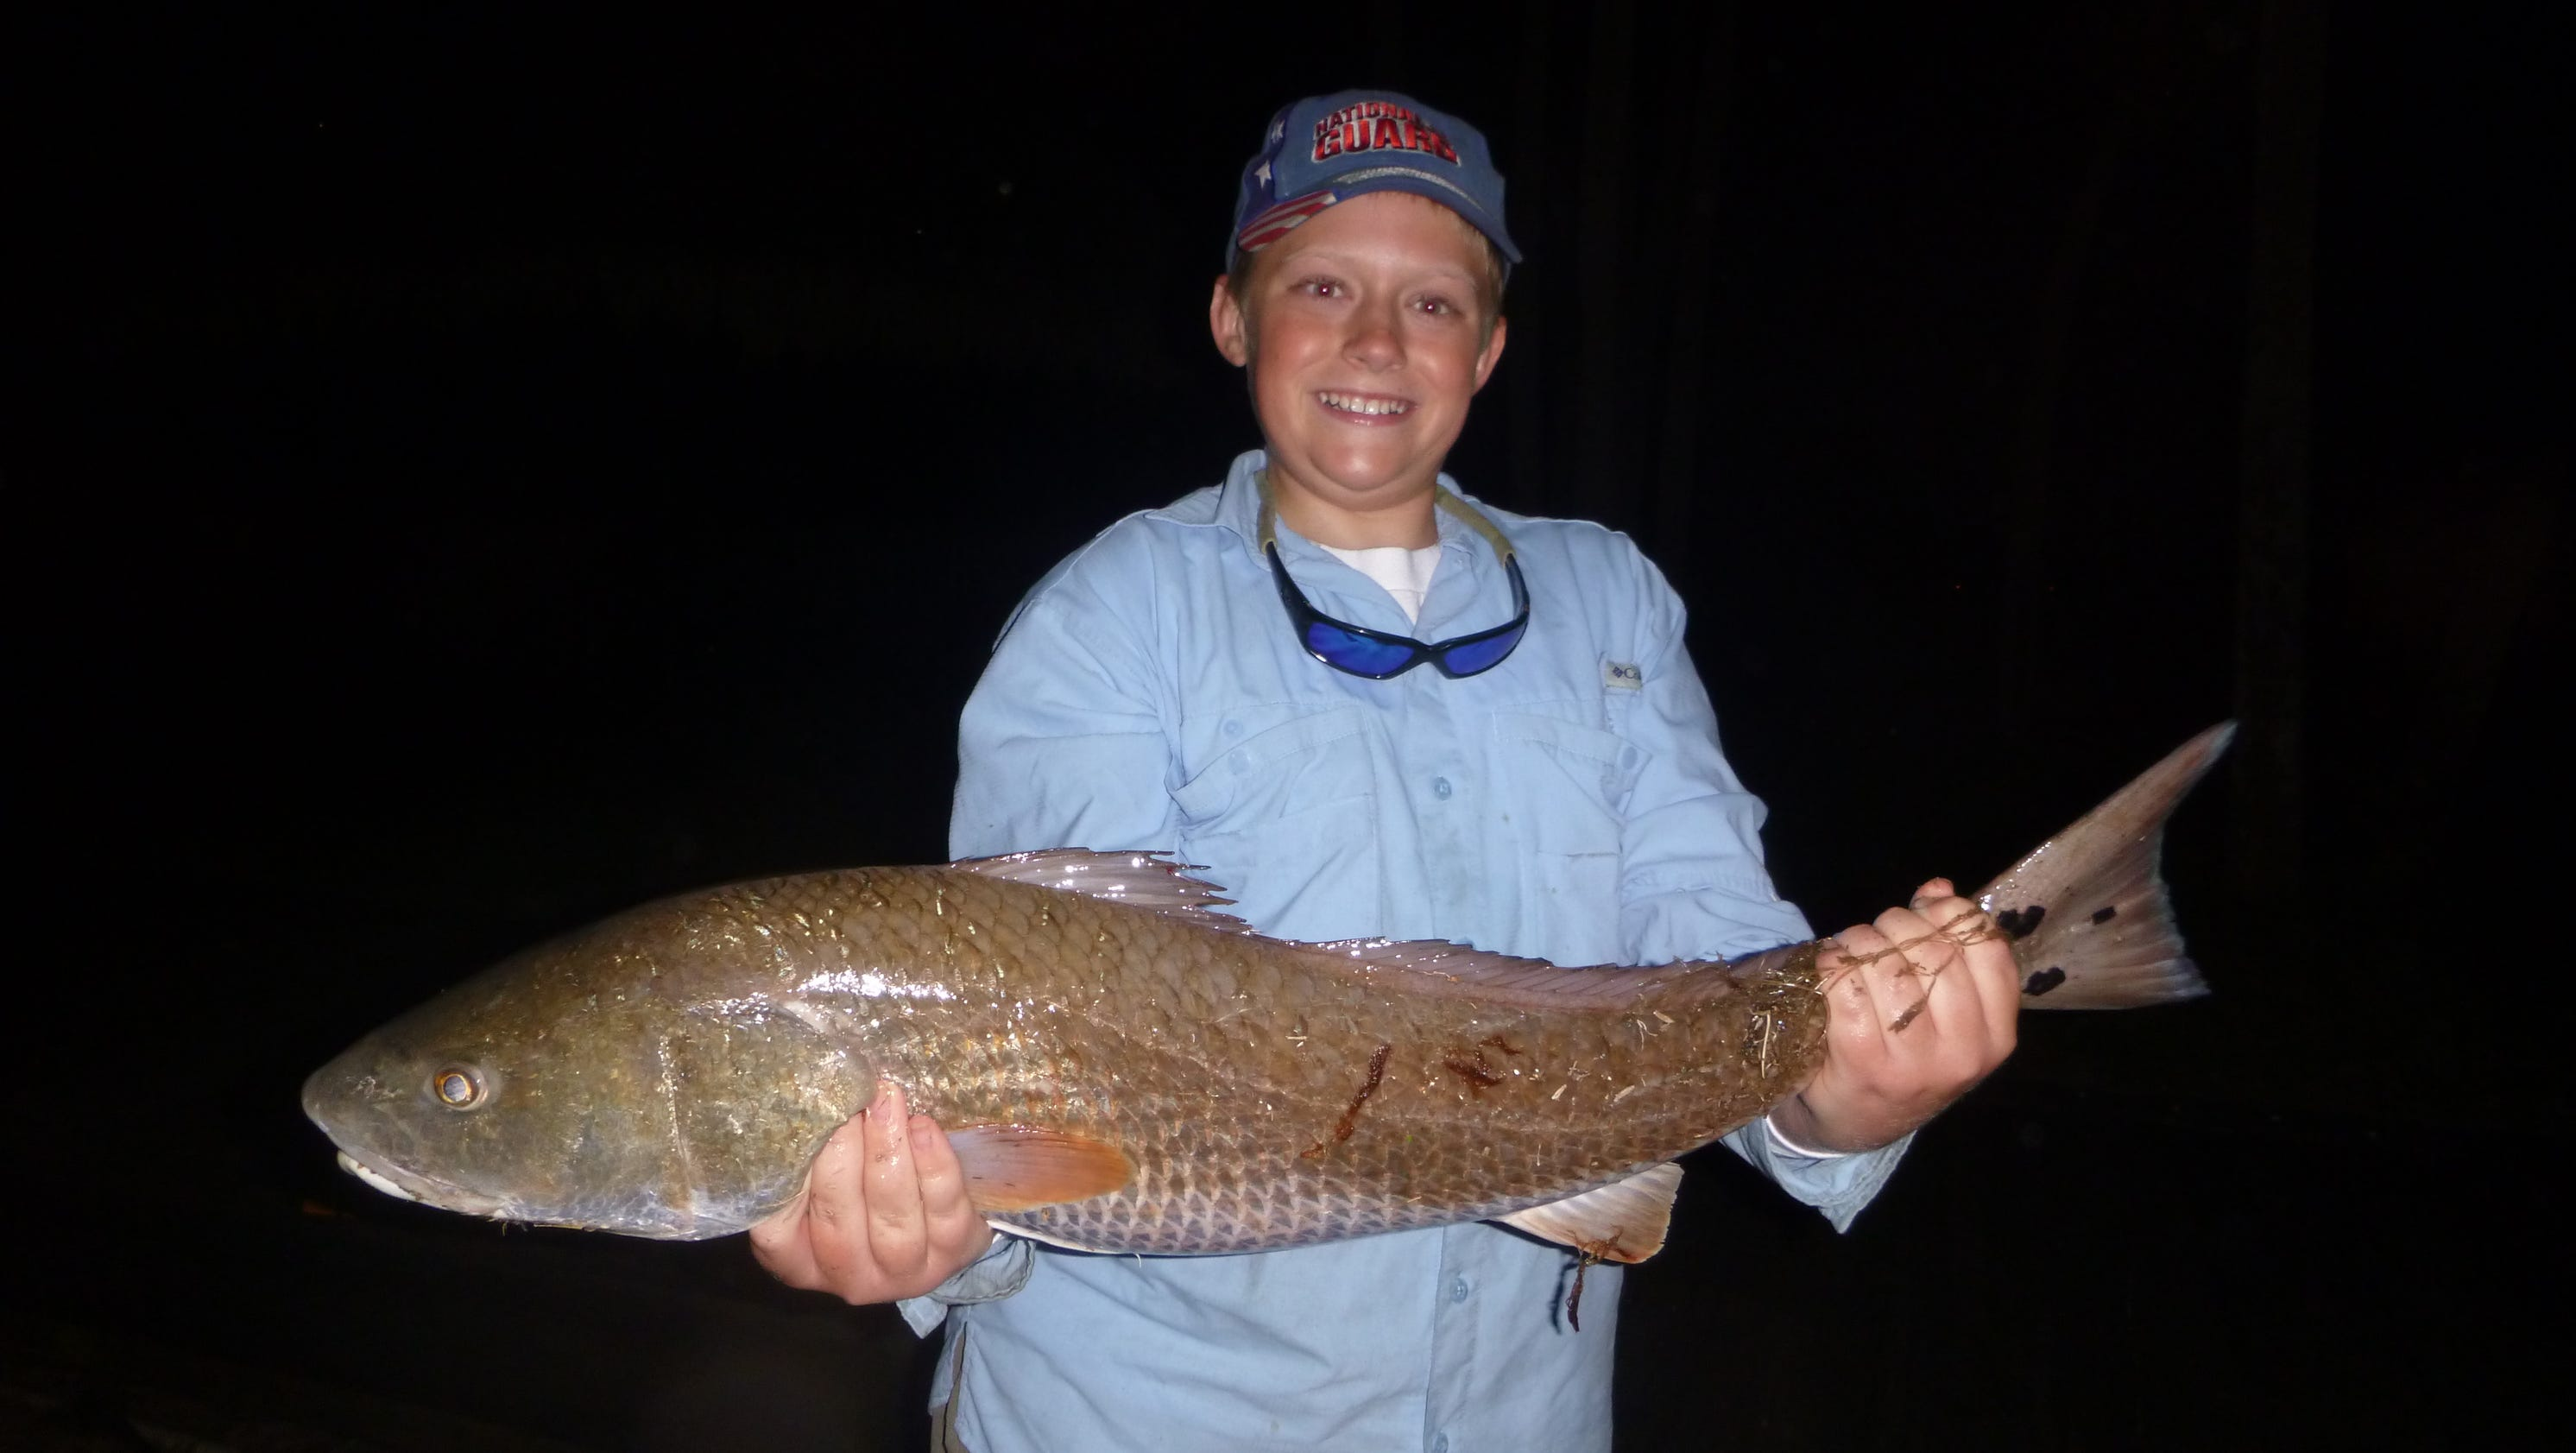 Matt badolato 39 s fishing forecast for Fishing forecast today